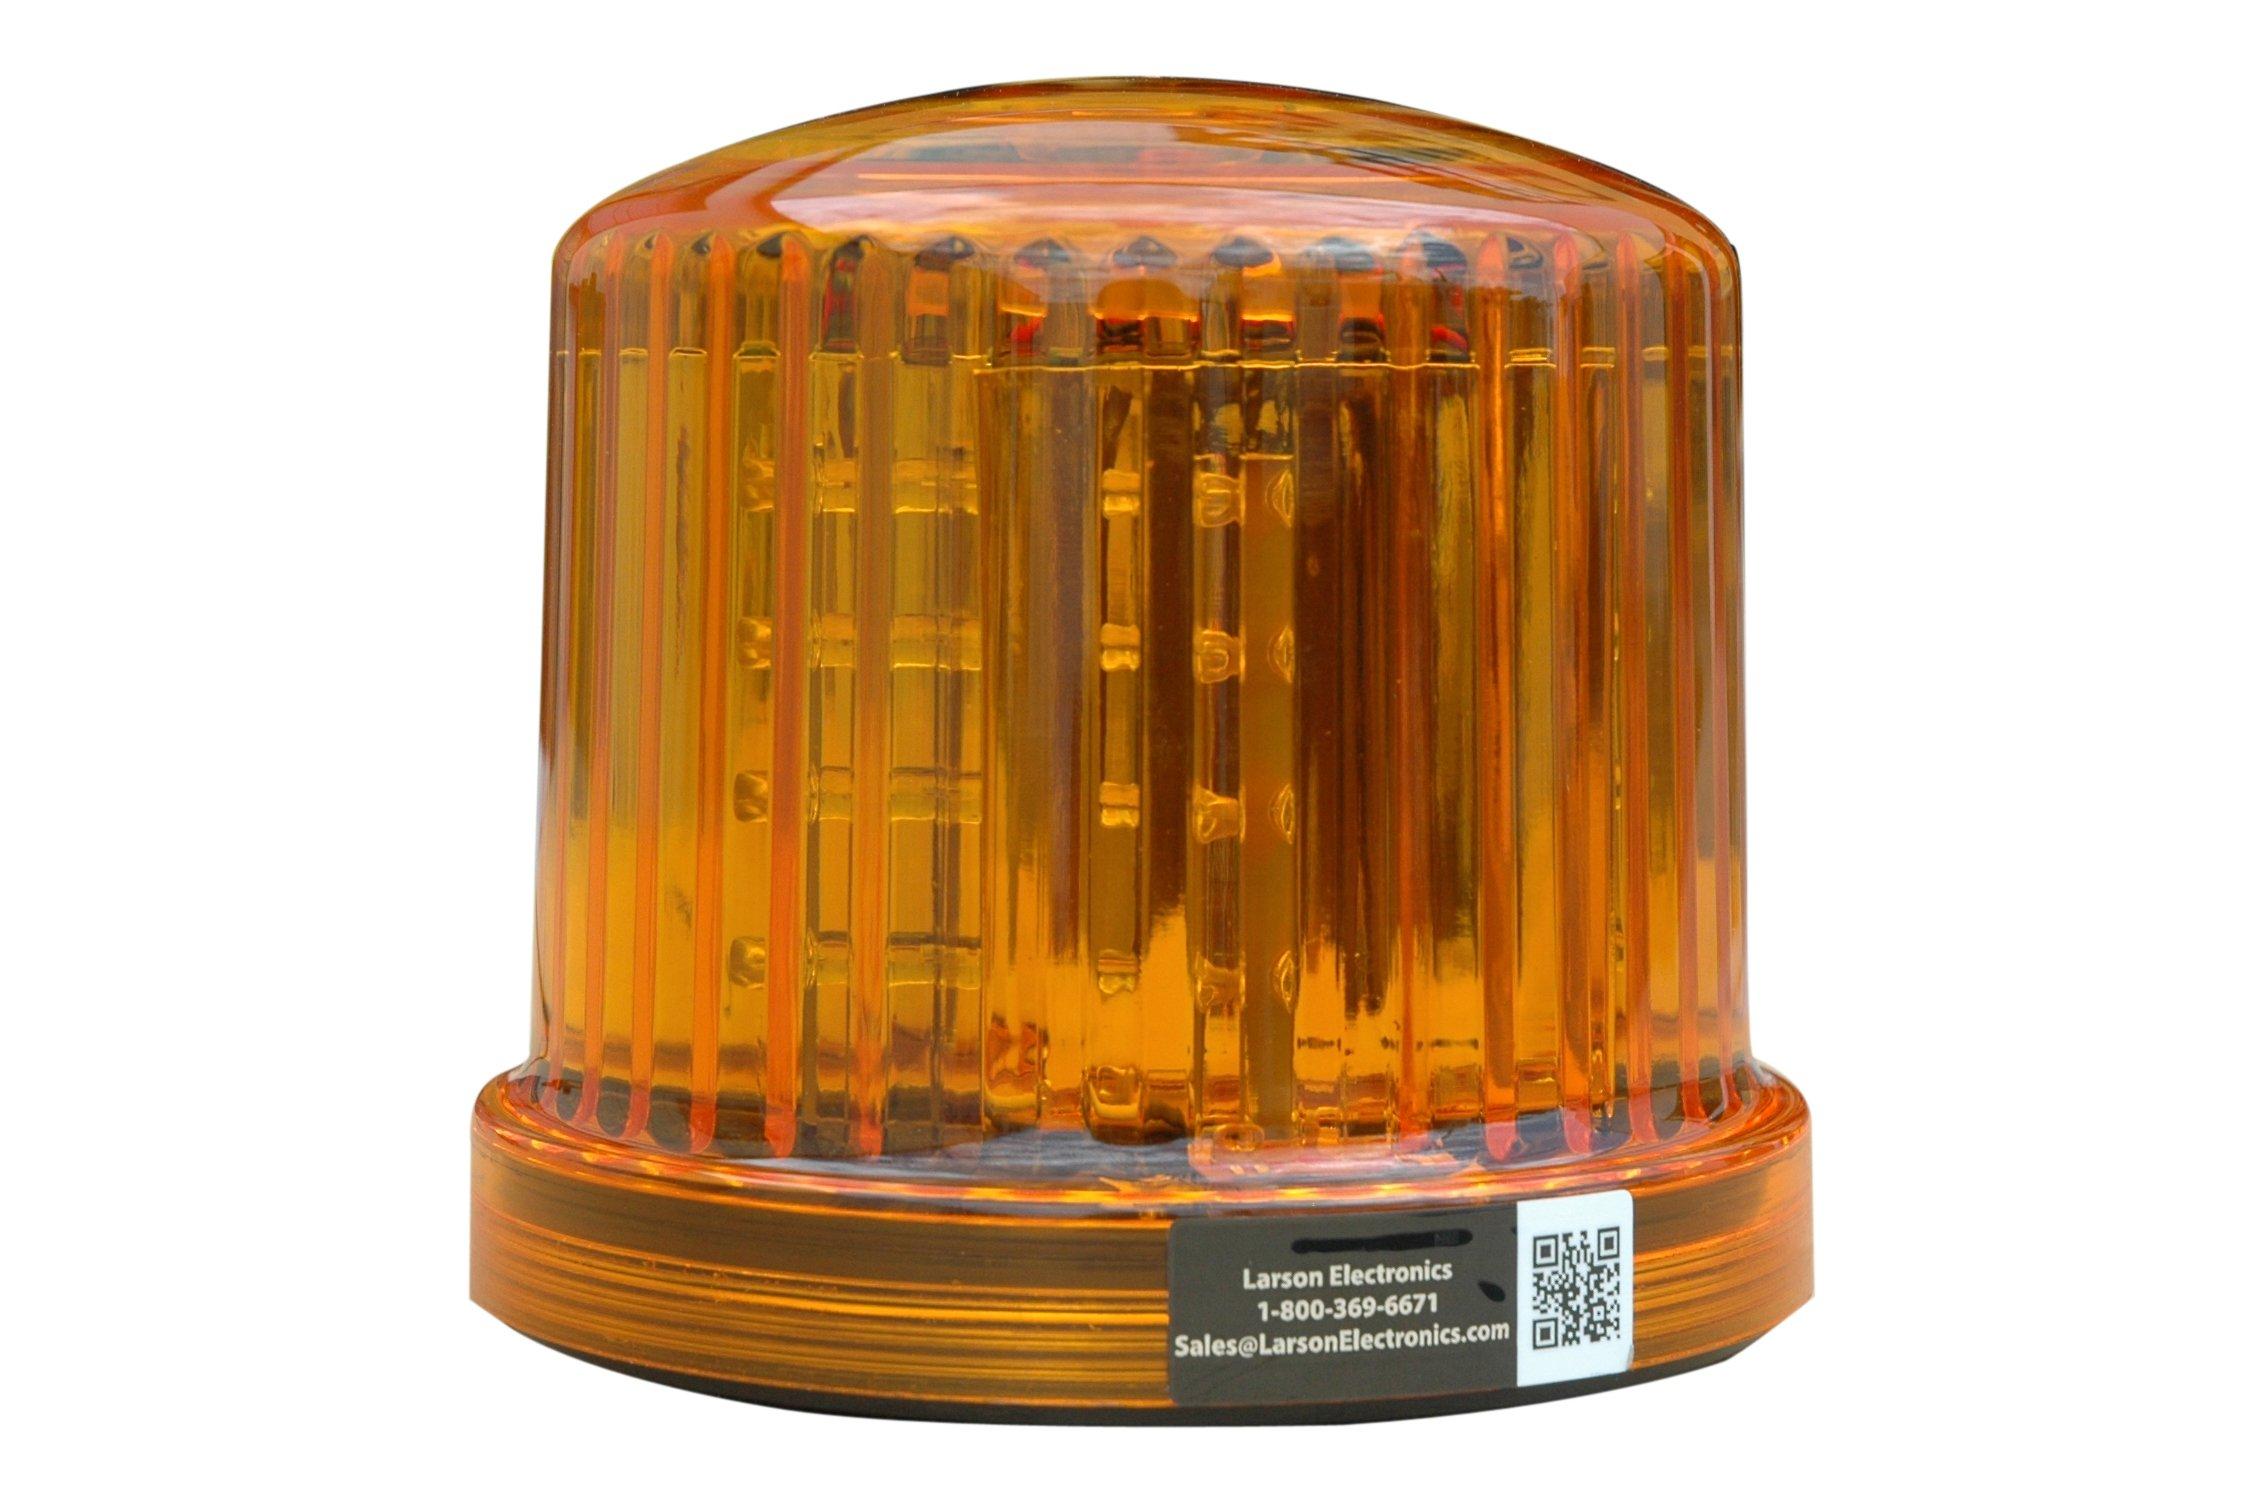 Larson Electronics SL-360-M-A Amber LED 360-Degree Beacon with Magnetic Base